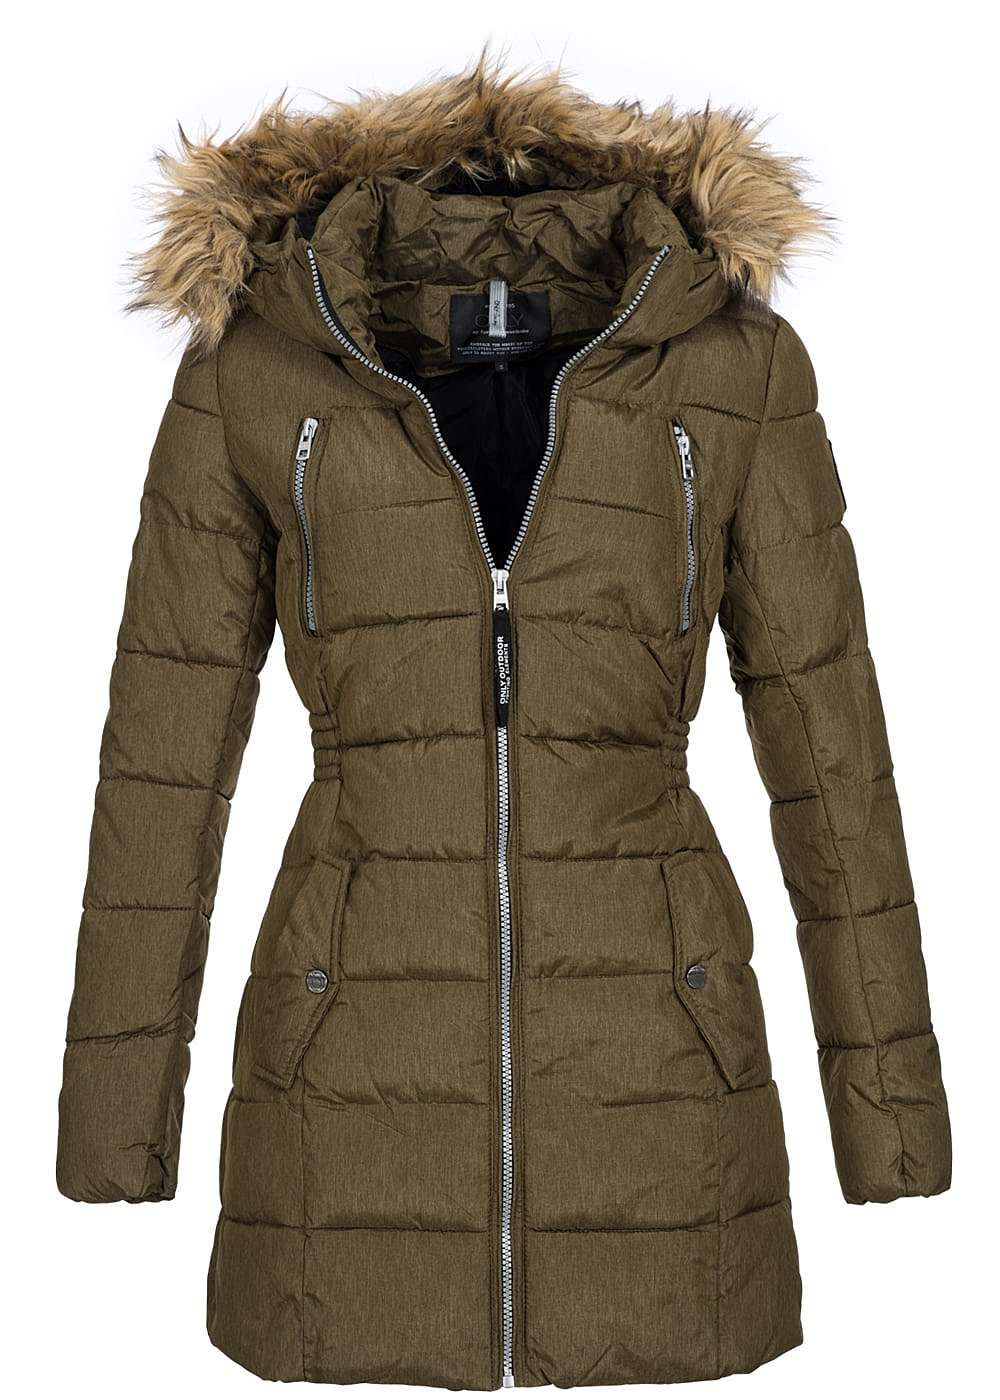 only damen winter mantel gesteppt kapuze kunstfell abn 4 taschen beech gr n 77onlineshop. Black Bedroom Furniture Sets. Home Design Ideas